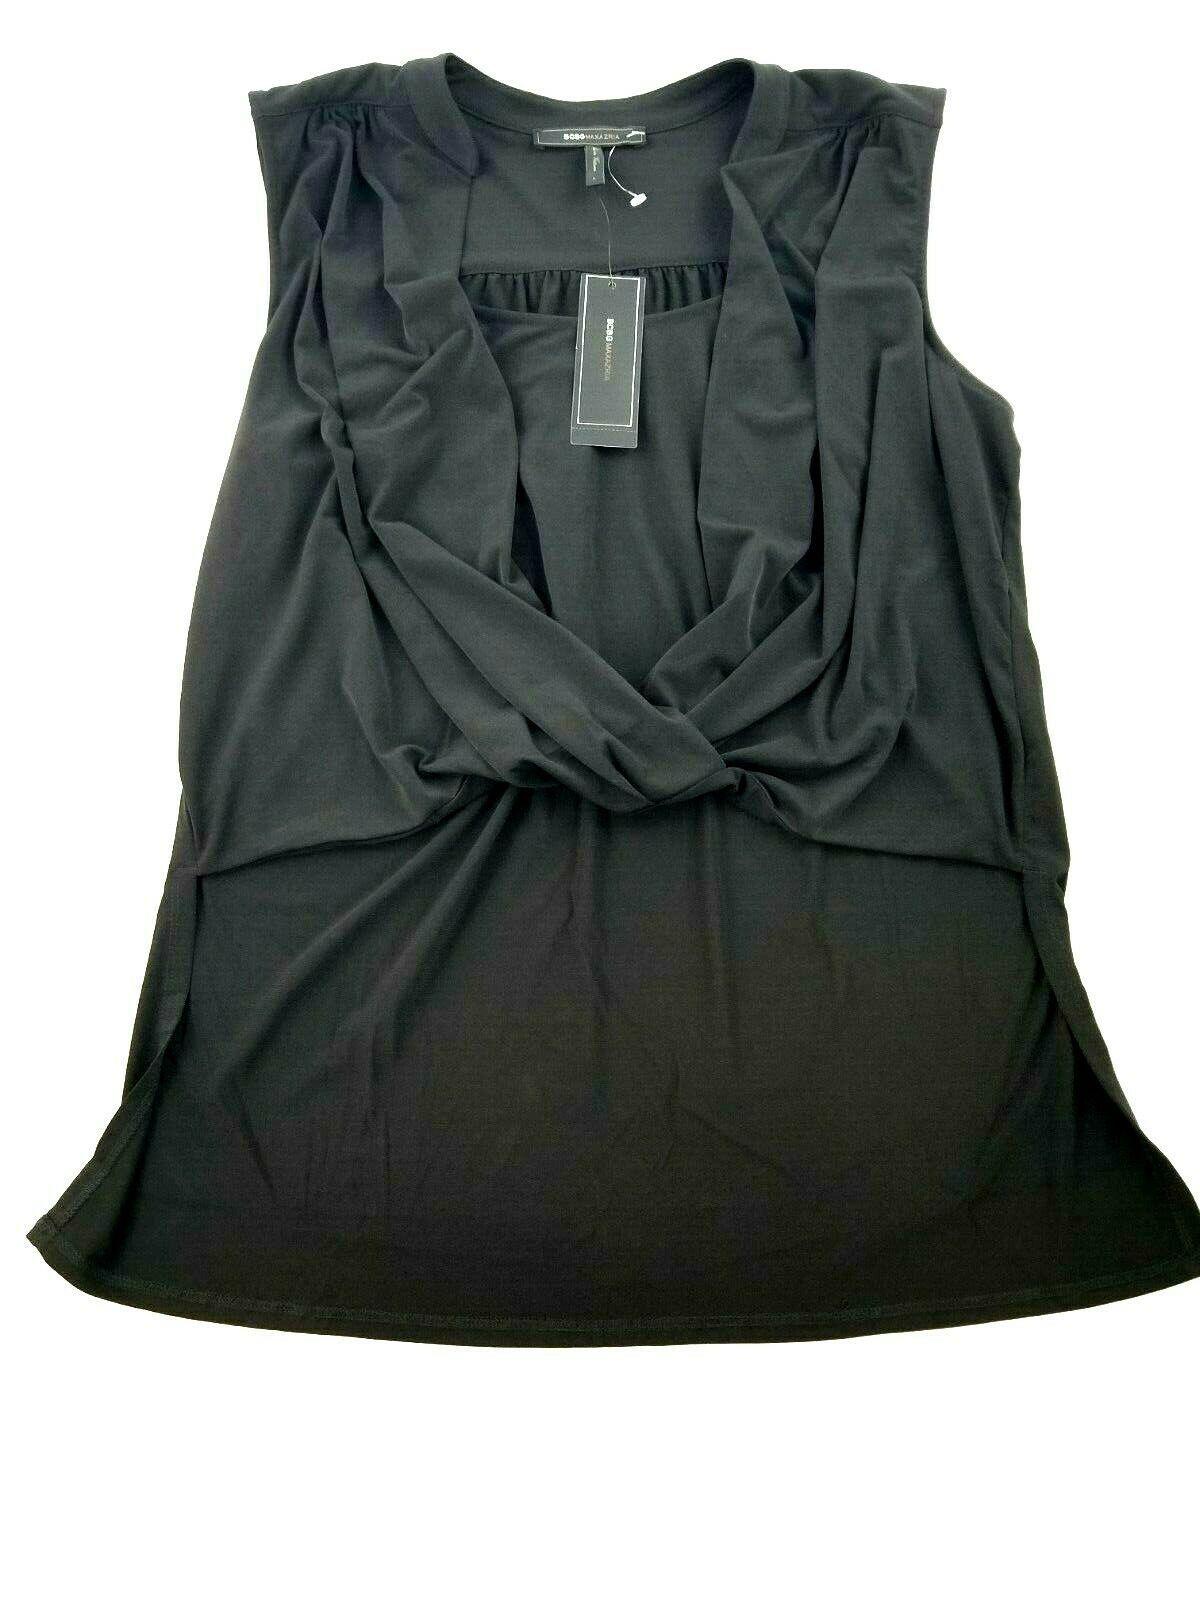 new BCBG MAXAZRIA women blouse YDM1242720-001 052019 black L MSRP $138 - $39.59